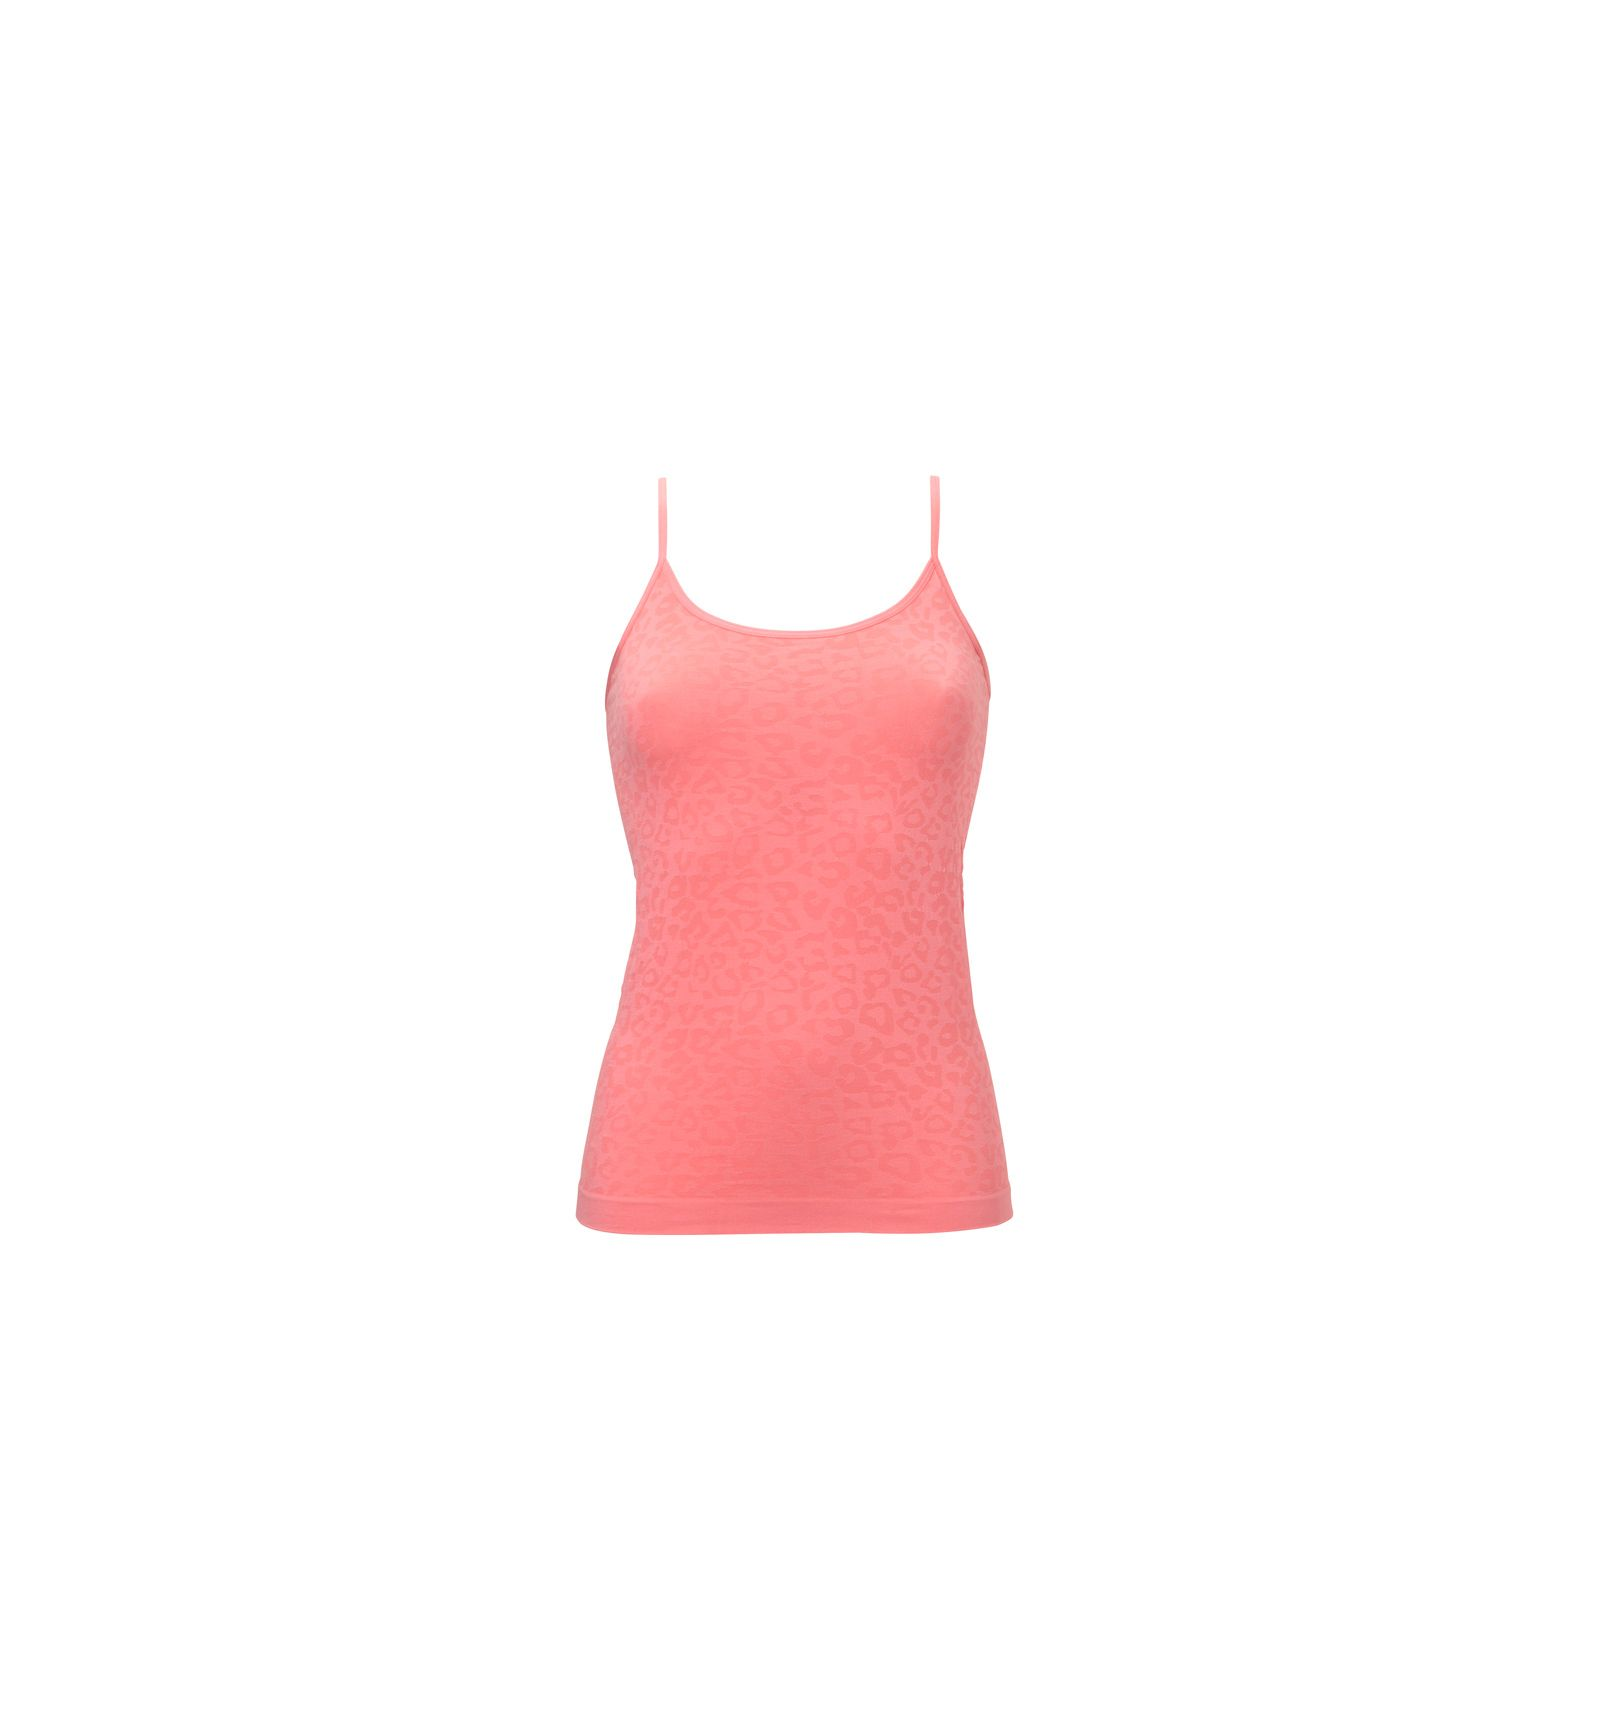 46610de7bb7 Ten Cate Dames Ondergoed Giftpack Spaghetti Shirt Black Lace - Nu ...